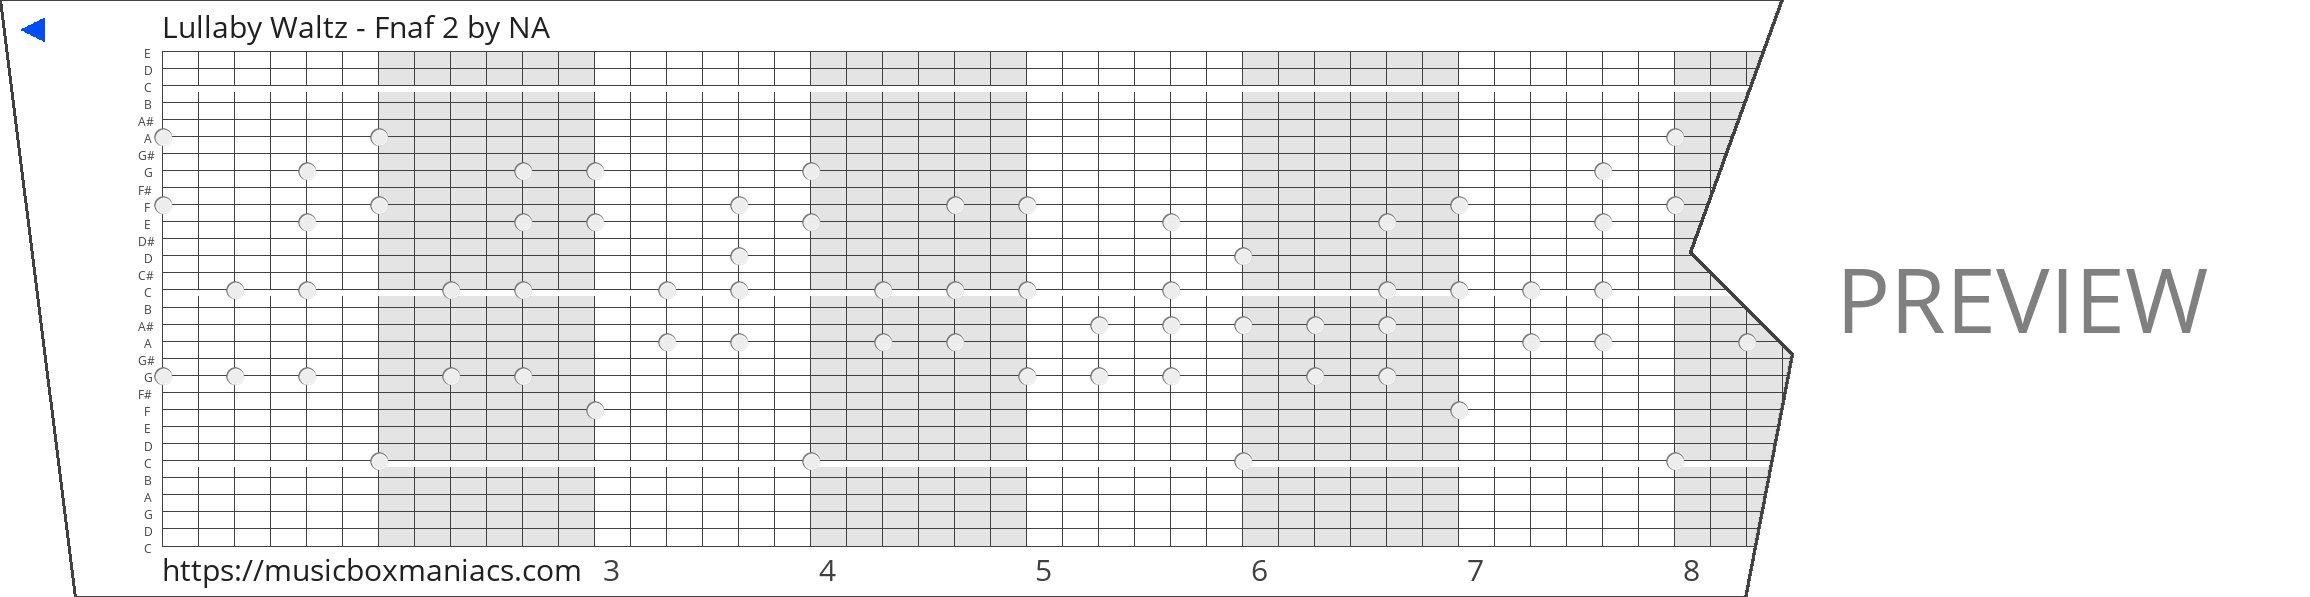 Lullaby Waltz - Fnaf 2 30 note music box paper strip